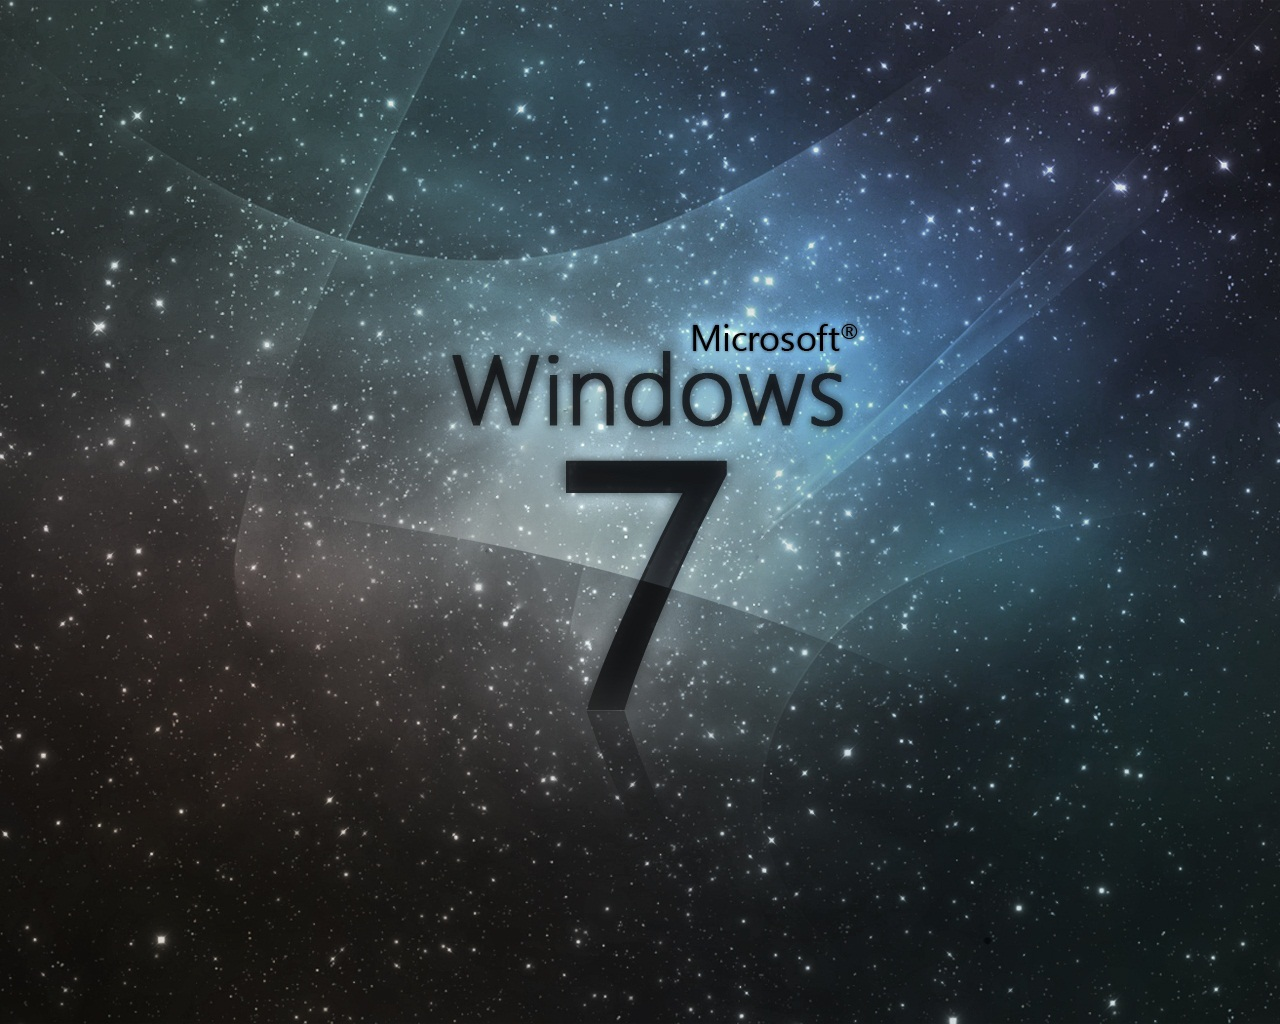 http://3.bp.blogspot.com/-MlnmYQq6KP4/Tz5Xf4VkvPI/AAAAAAAADL0/-LqDILZYVAo/s1600/microsoft+windows+7.jpg